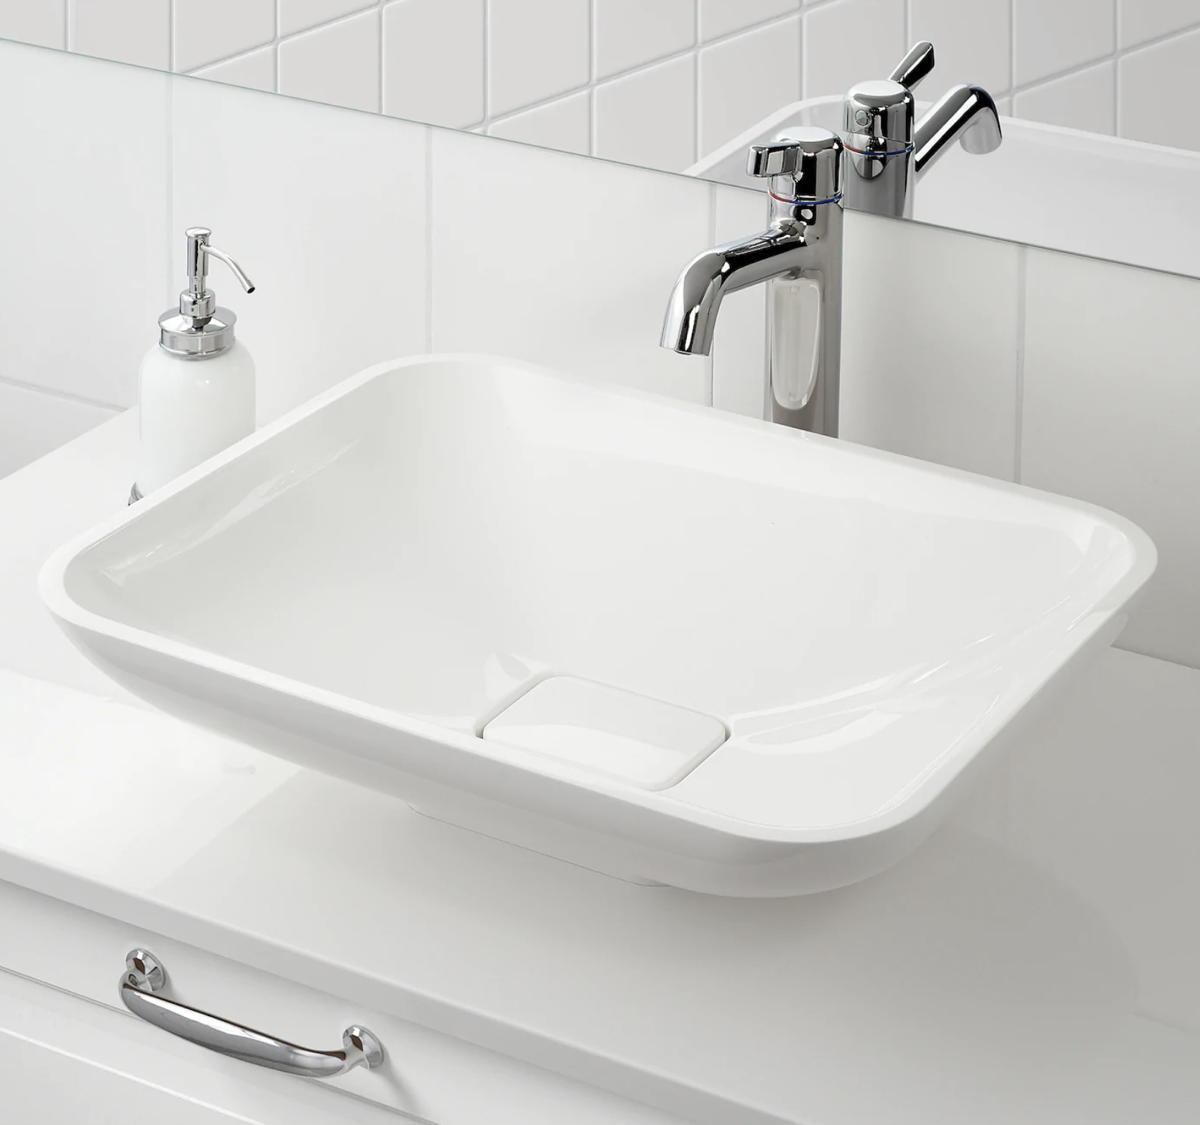 Ikea Arredo Bagno Prezzi.Catalogo Bagni Ikea 2020 Novita E Vantaggi